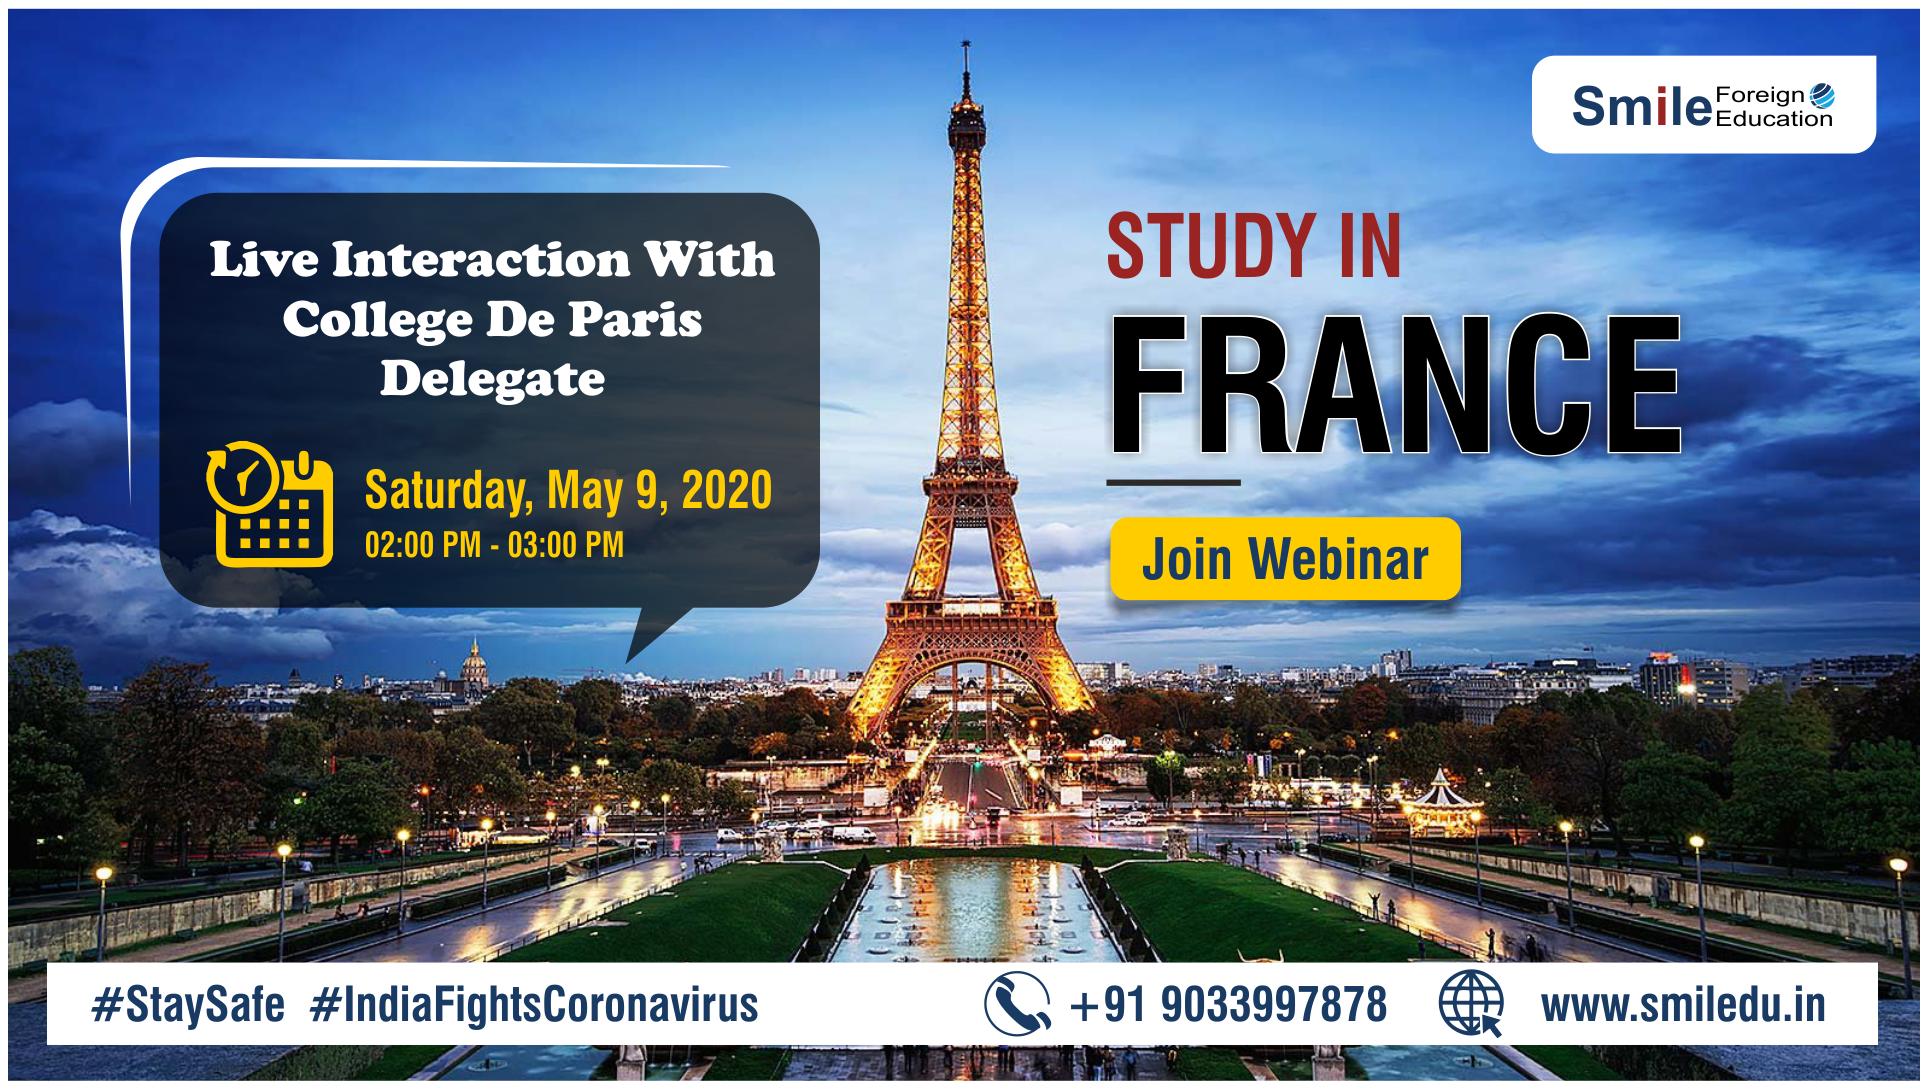 STUDY IN FRANCE – WEBINAR BY COLLEGE DE PARIS